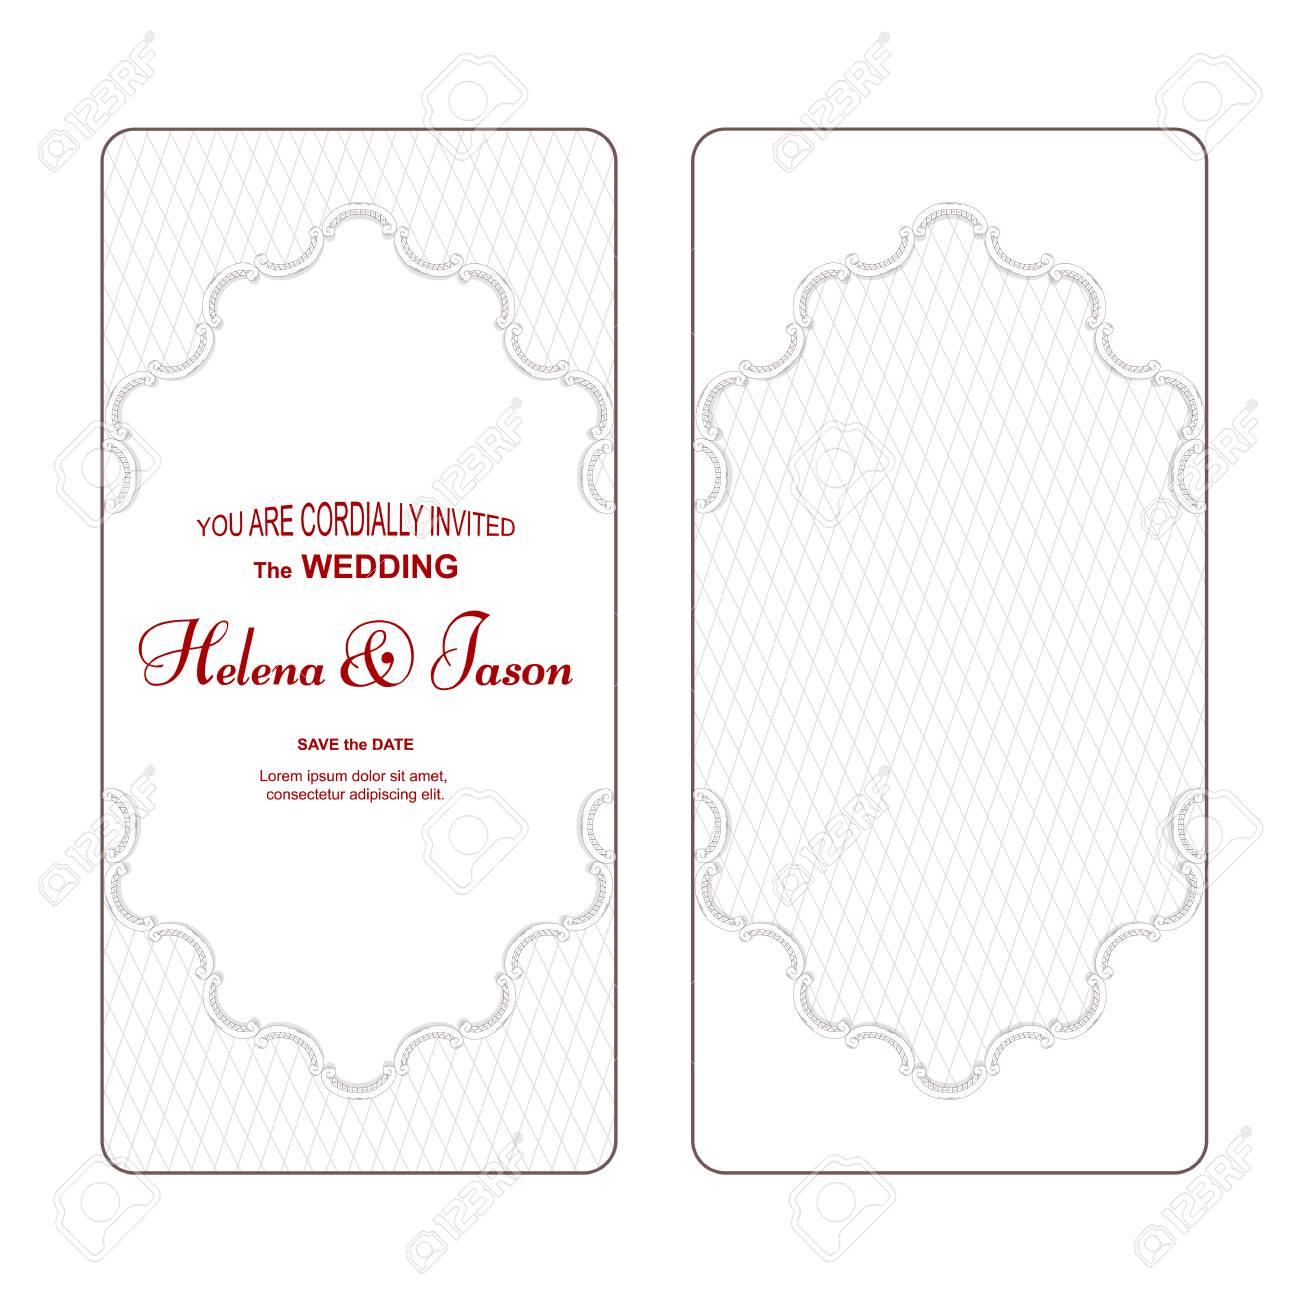 An Elegant Vertical Vintage White For The Wedding Invitation ...